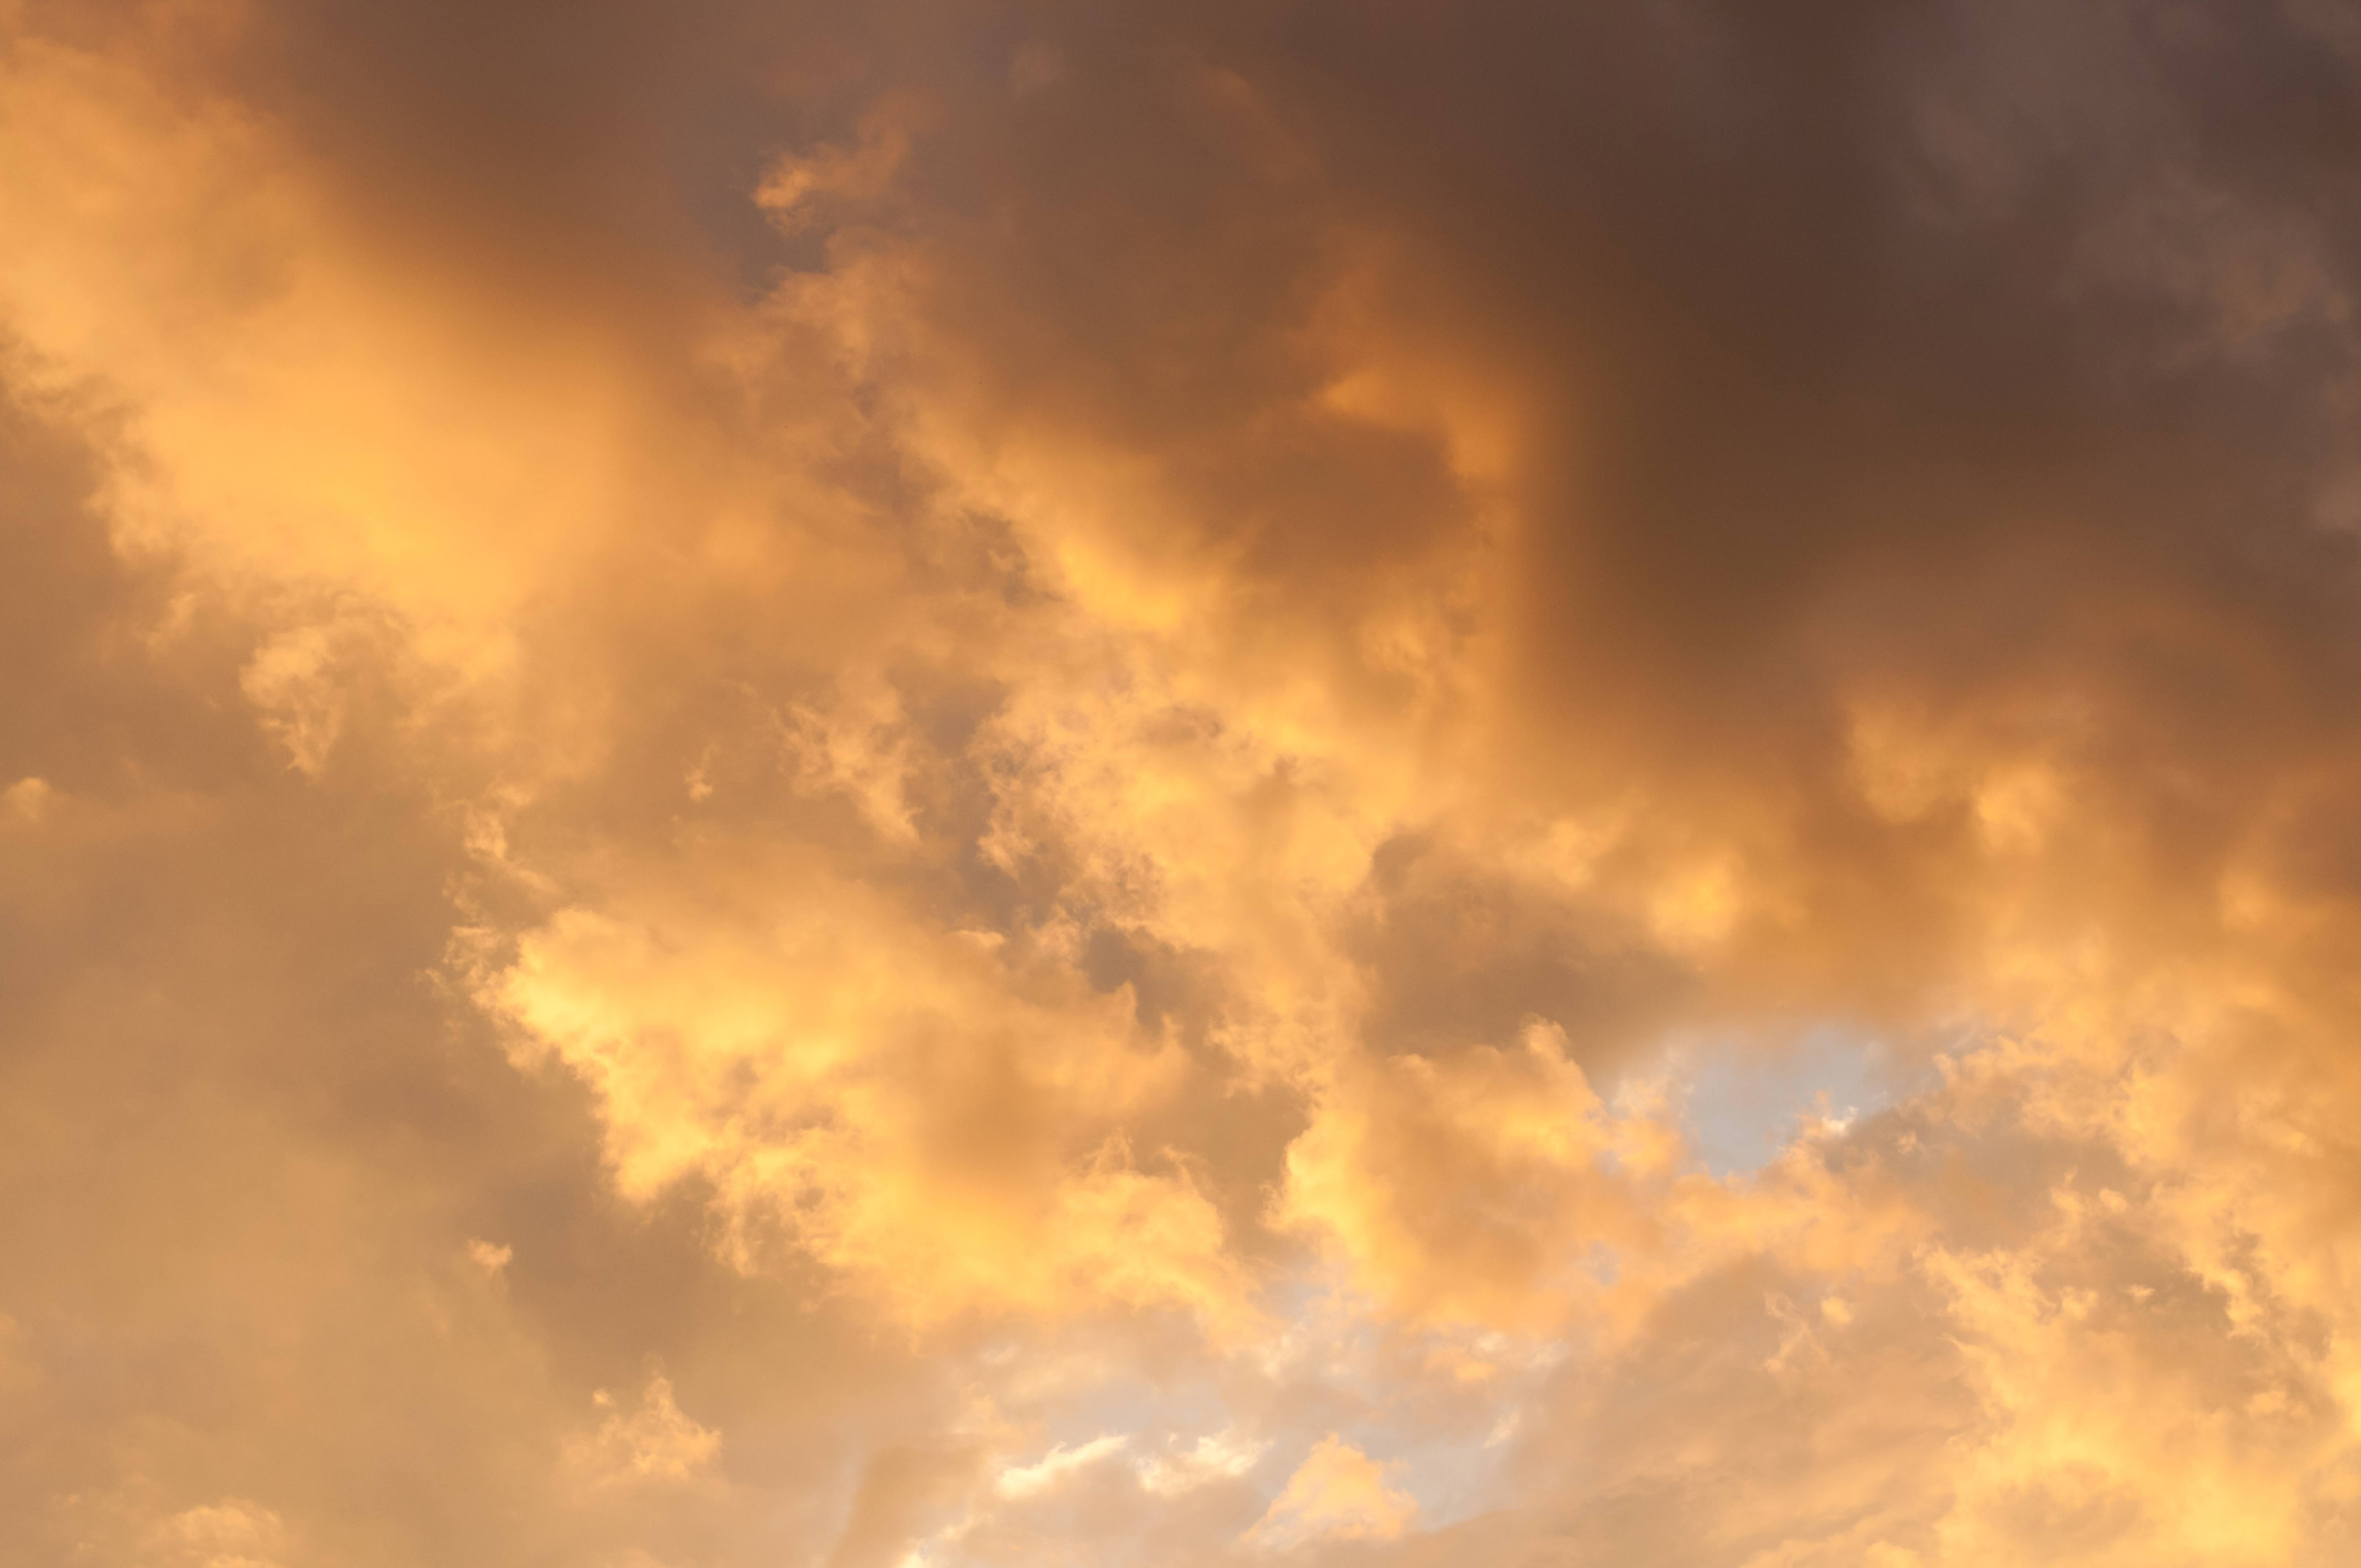 Dramatic Cloudy Sunset Sky